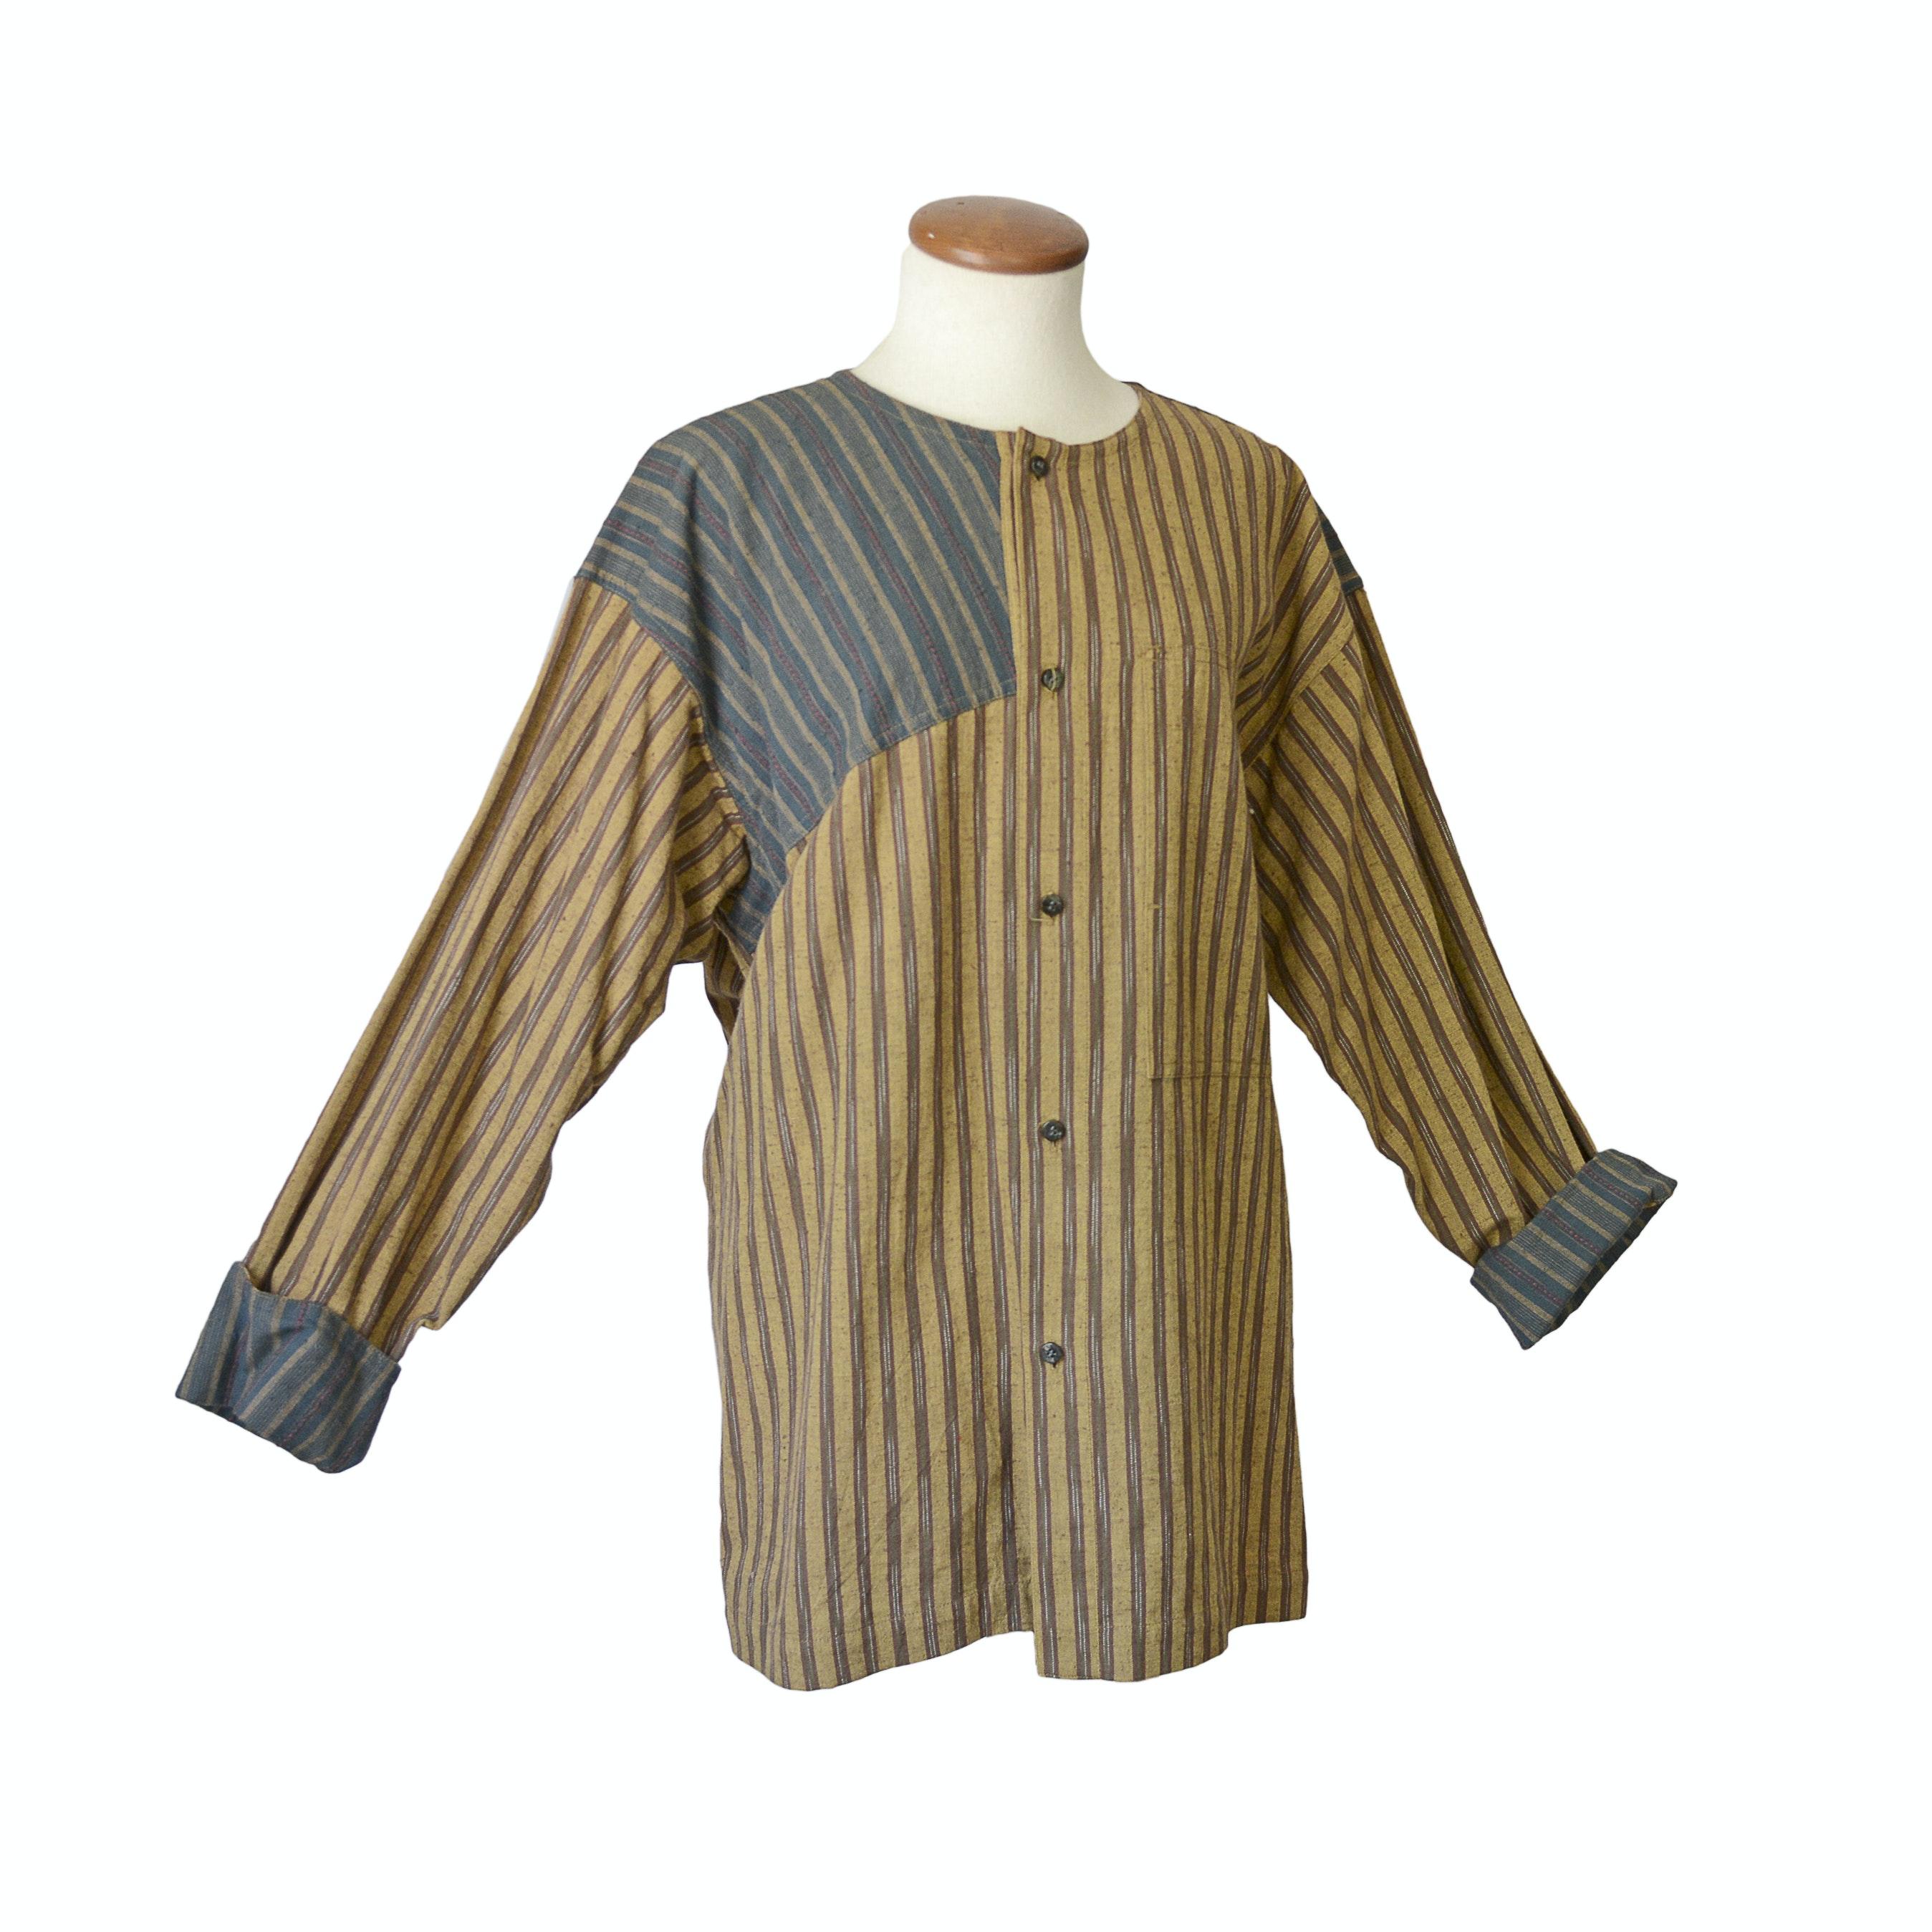 Issey Miyake Plantation Button Down Women's Shirt